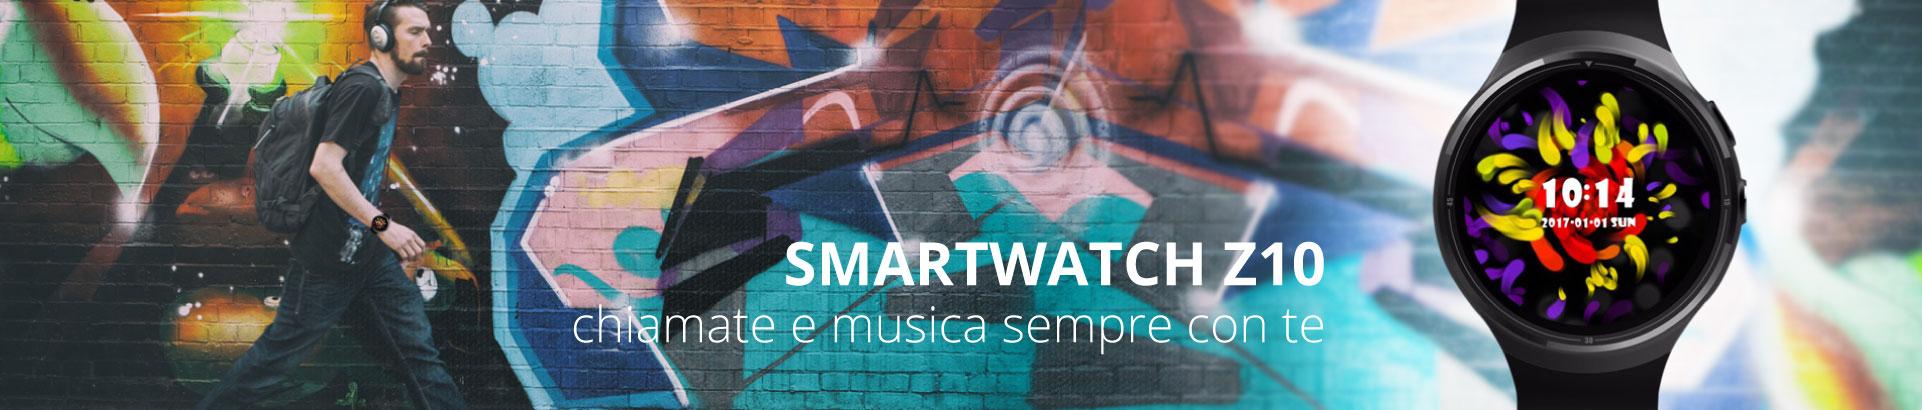 Smartwatch Bluetooth con Sim